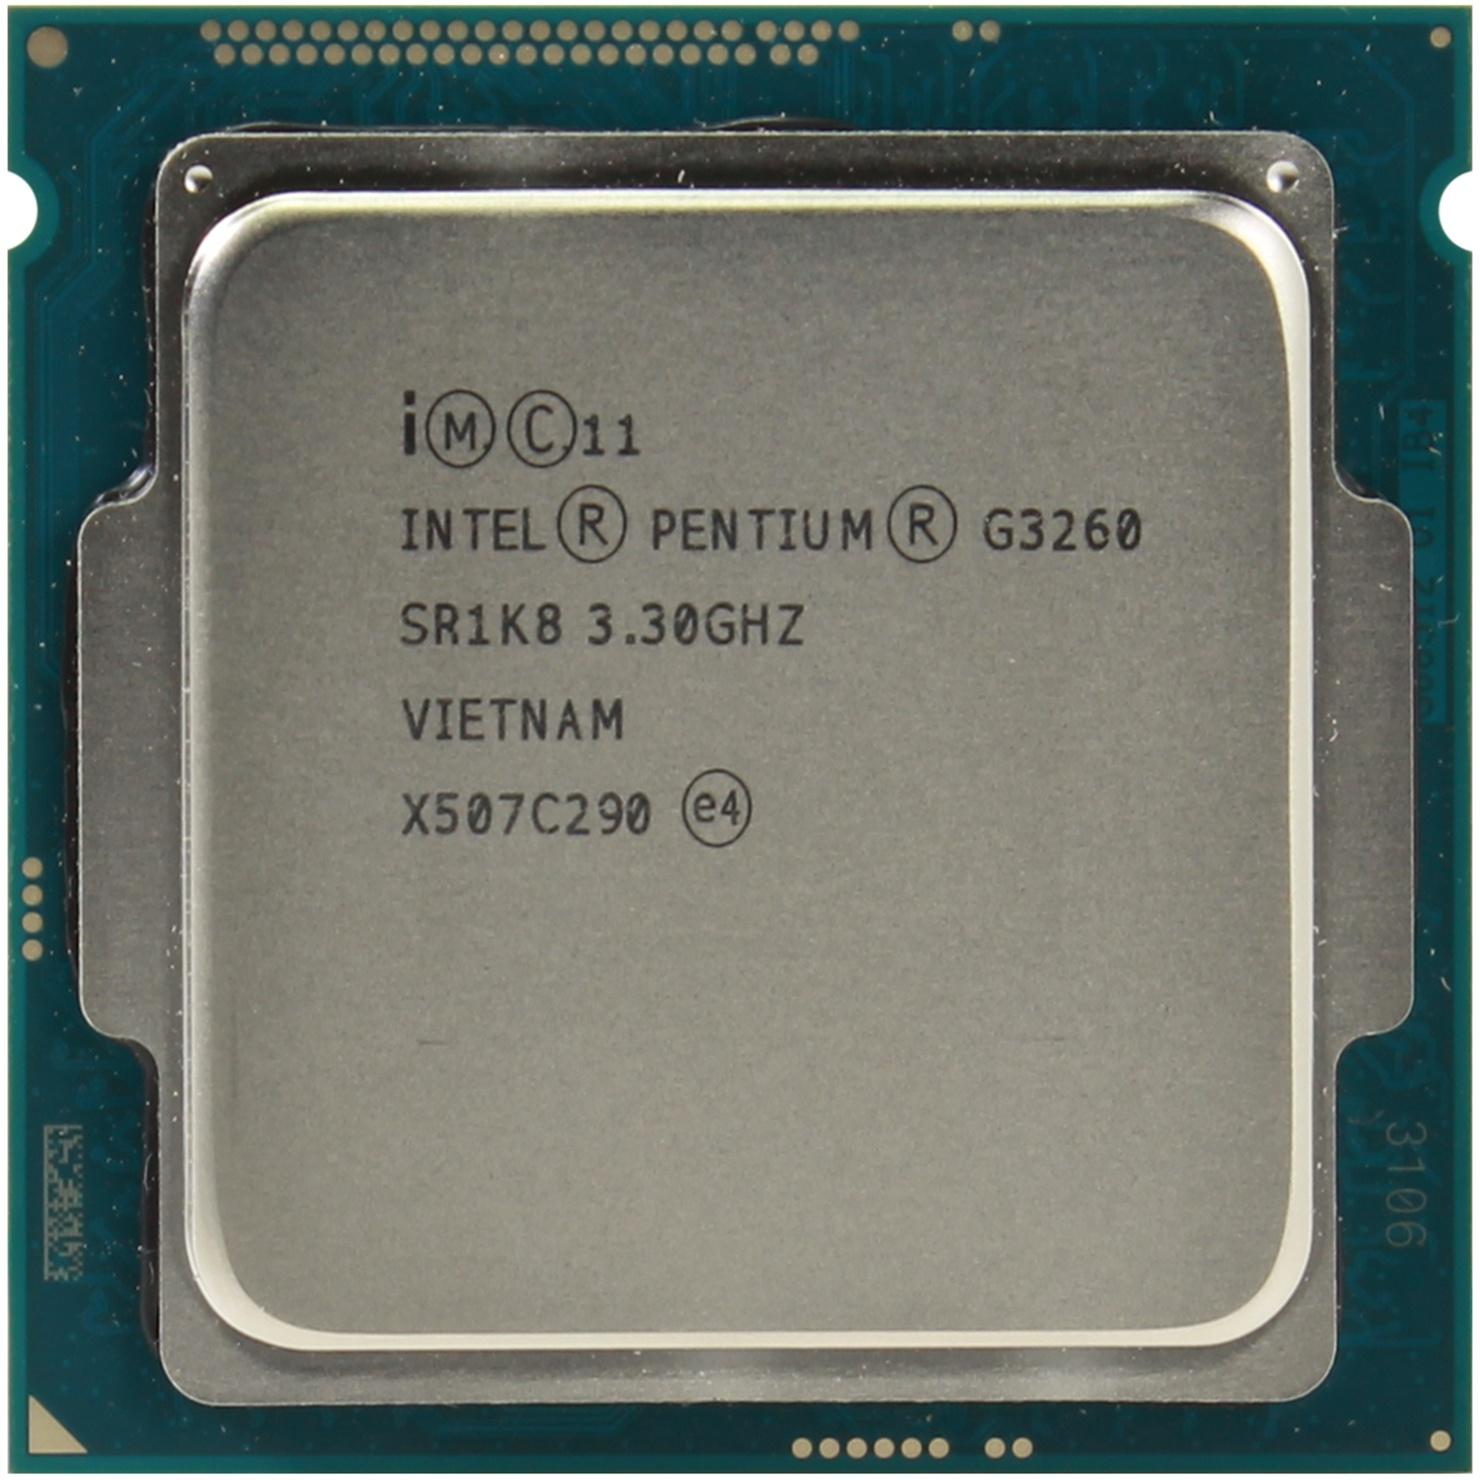 Процесор INTEL Pentium G3260 (BX80646G3260) s1150, 2 ядра, 3.30GHz, Intel HD Graphics, DMI 5 GT/s,